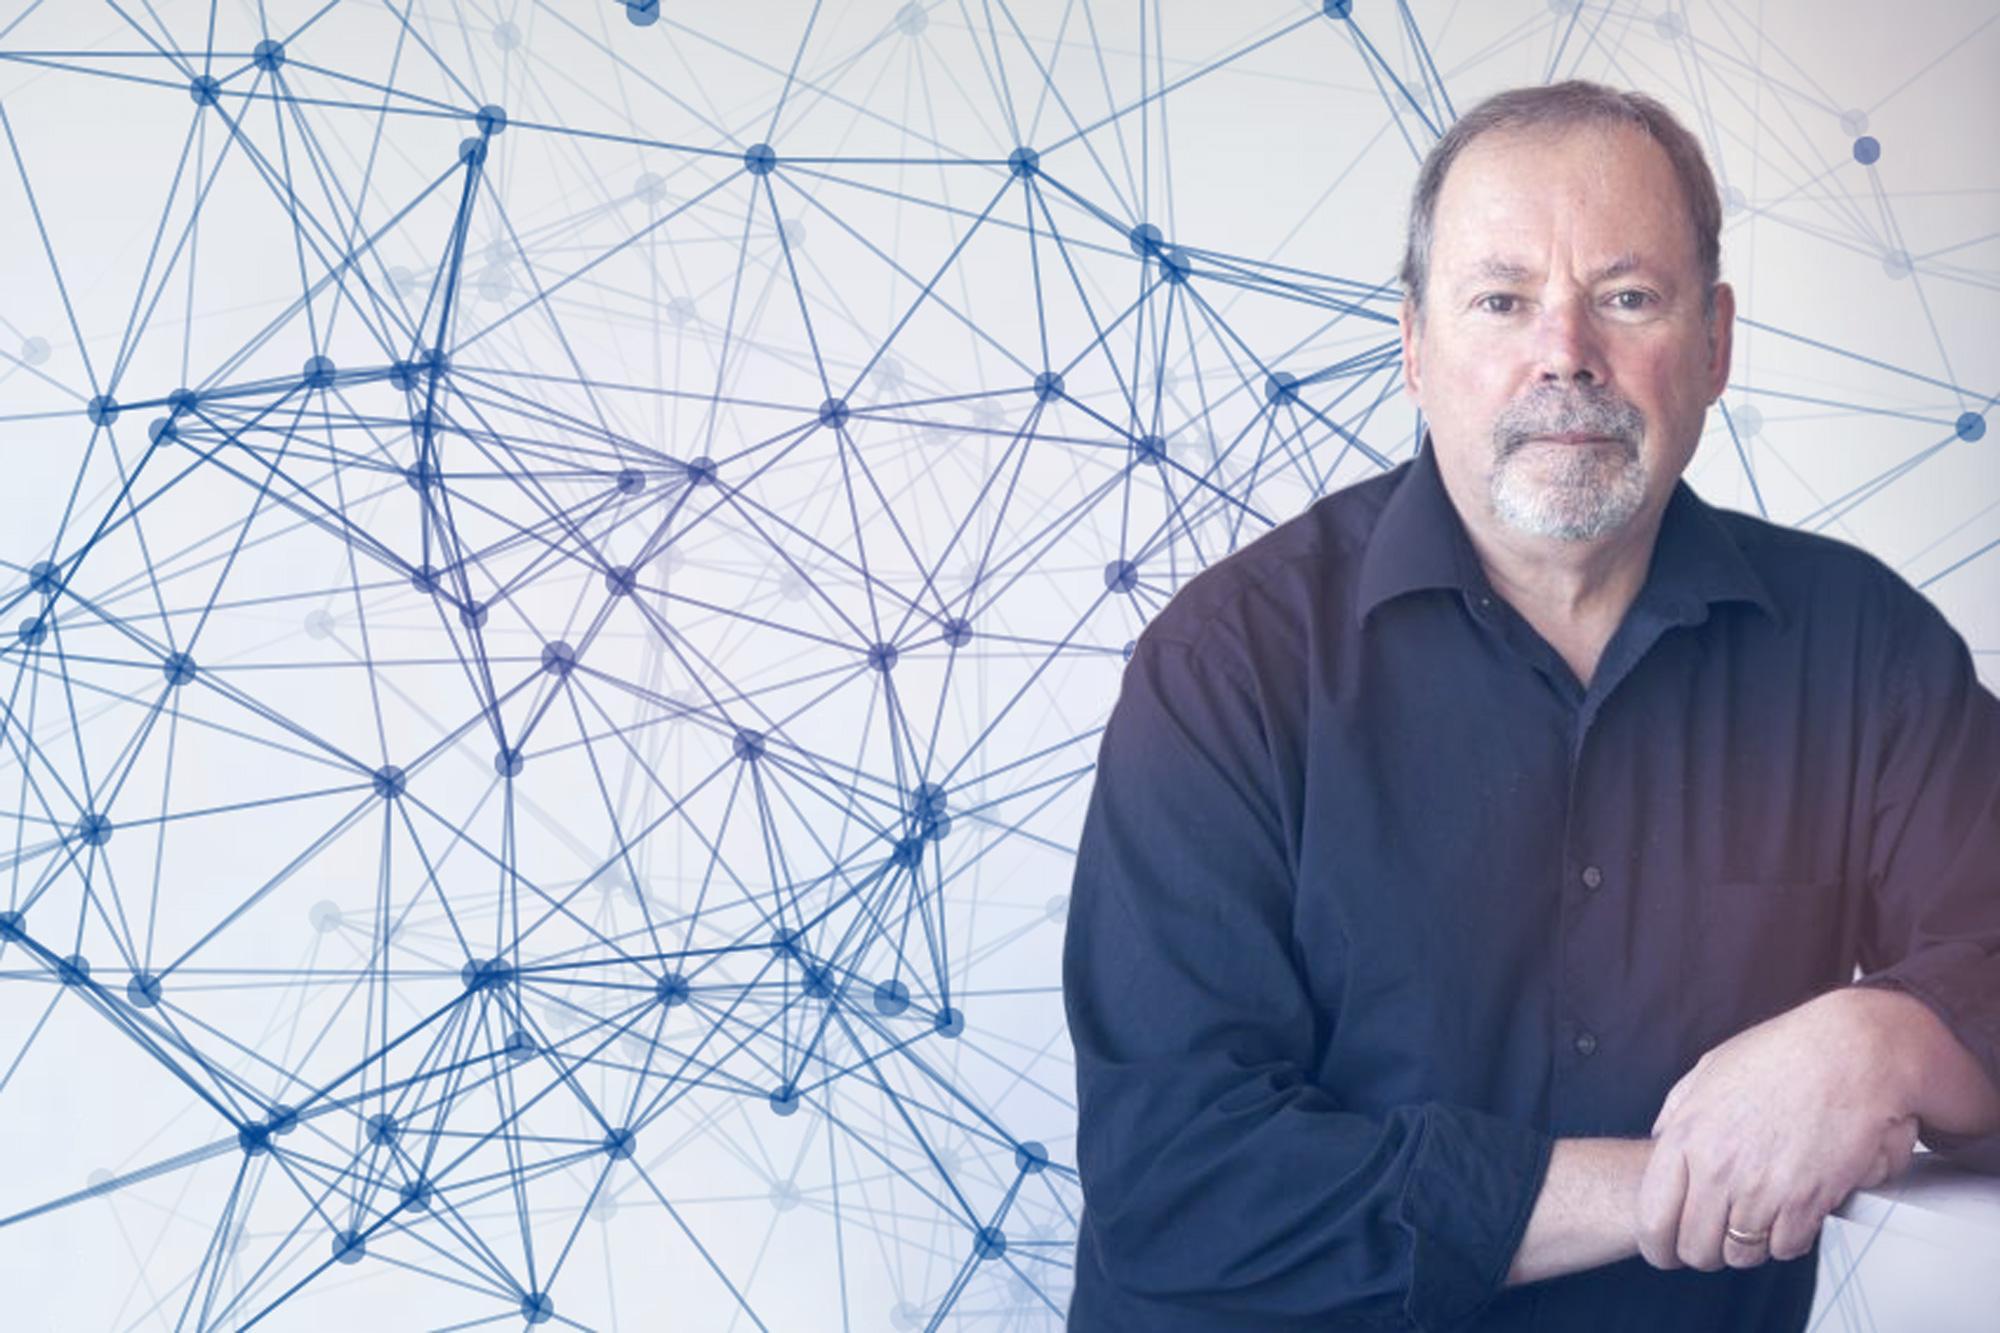 Philip Bourne, director of UVA's Data Science Institute, this Friday co-hosts Datapalooza.